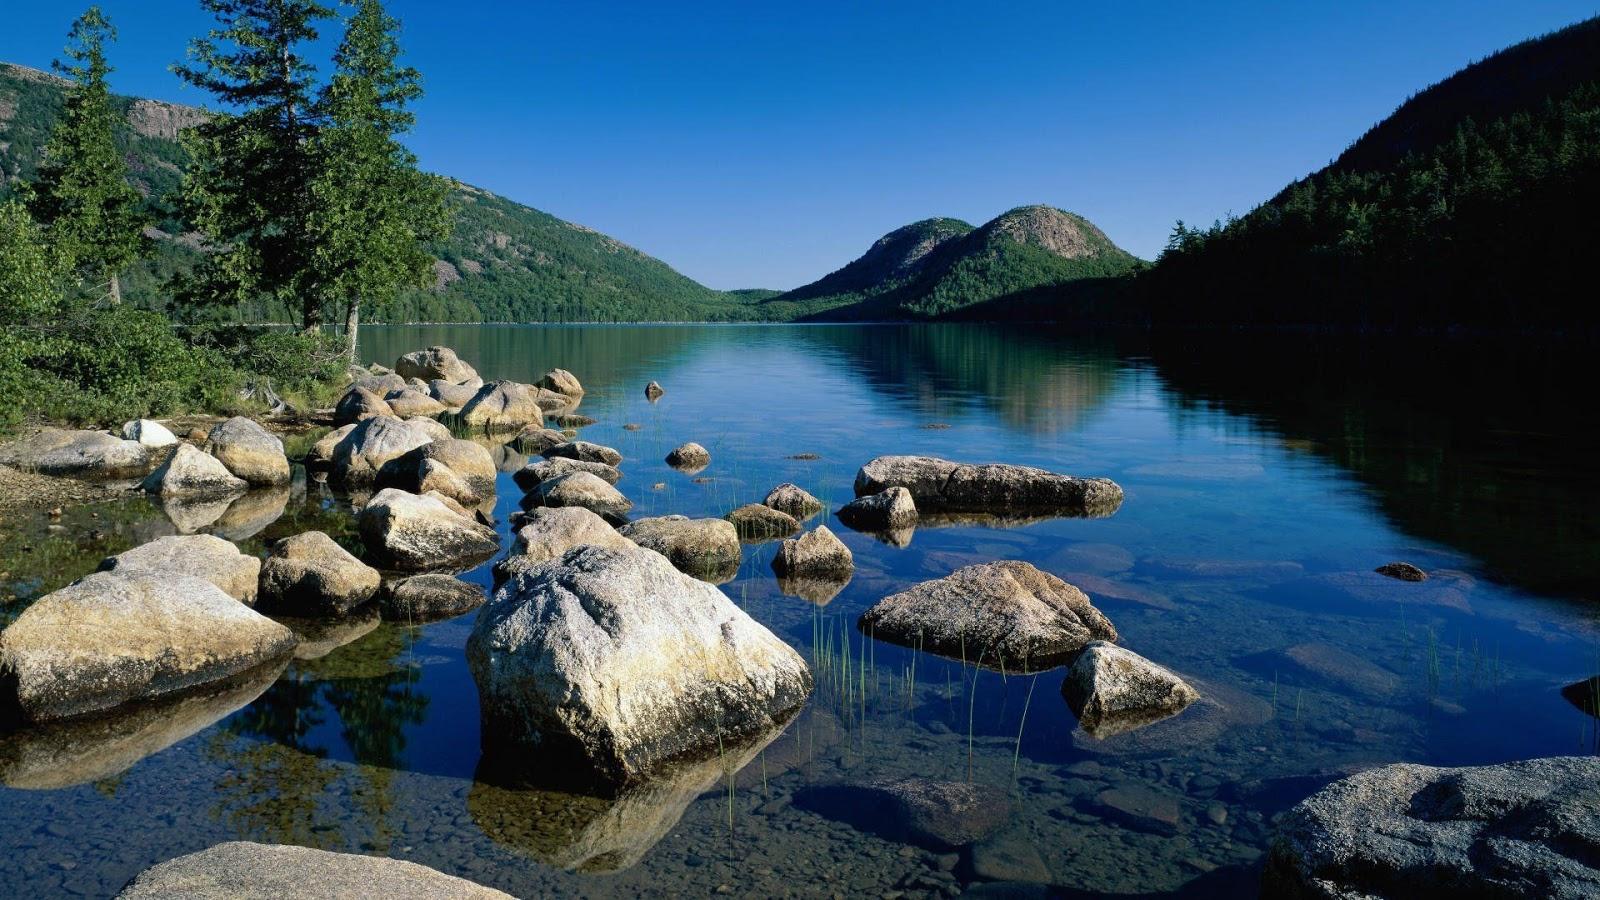 jordan pond acadia national park maine lake reservoir national wallpaper